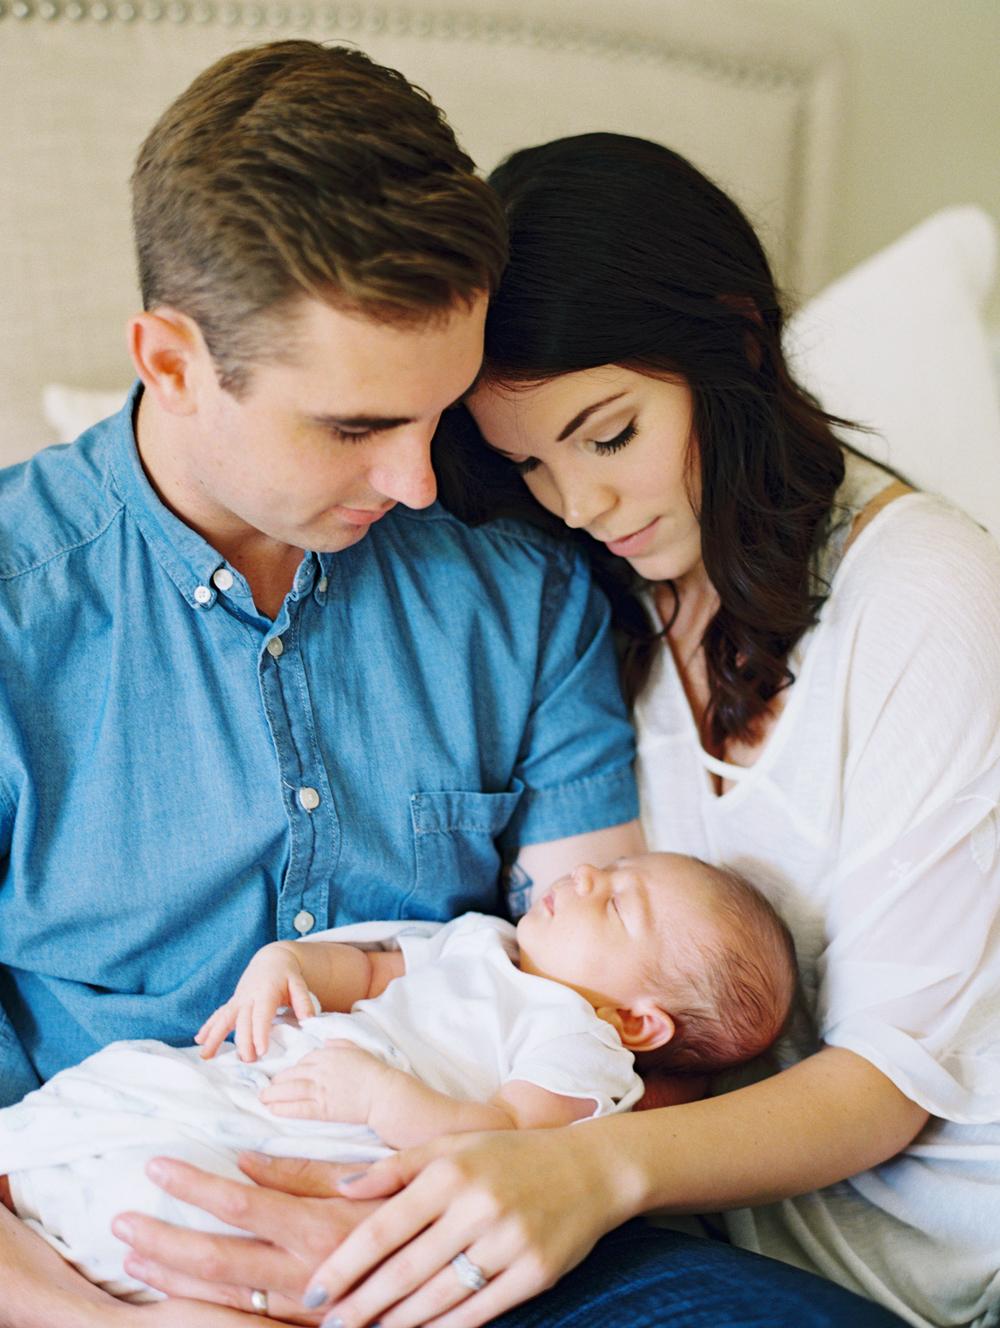 south-bay-newborn-photographer-1007.jpg